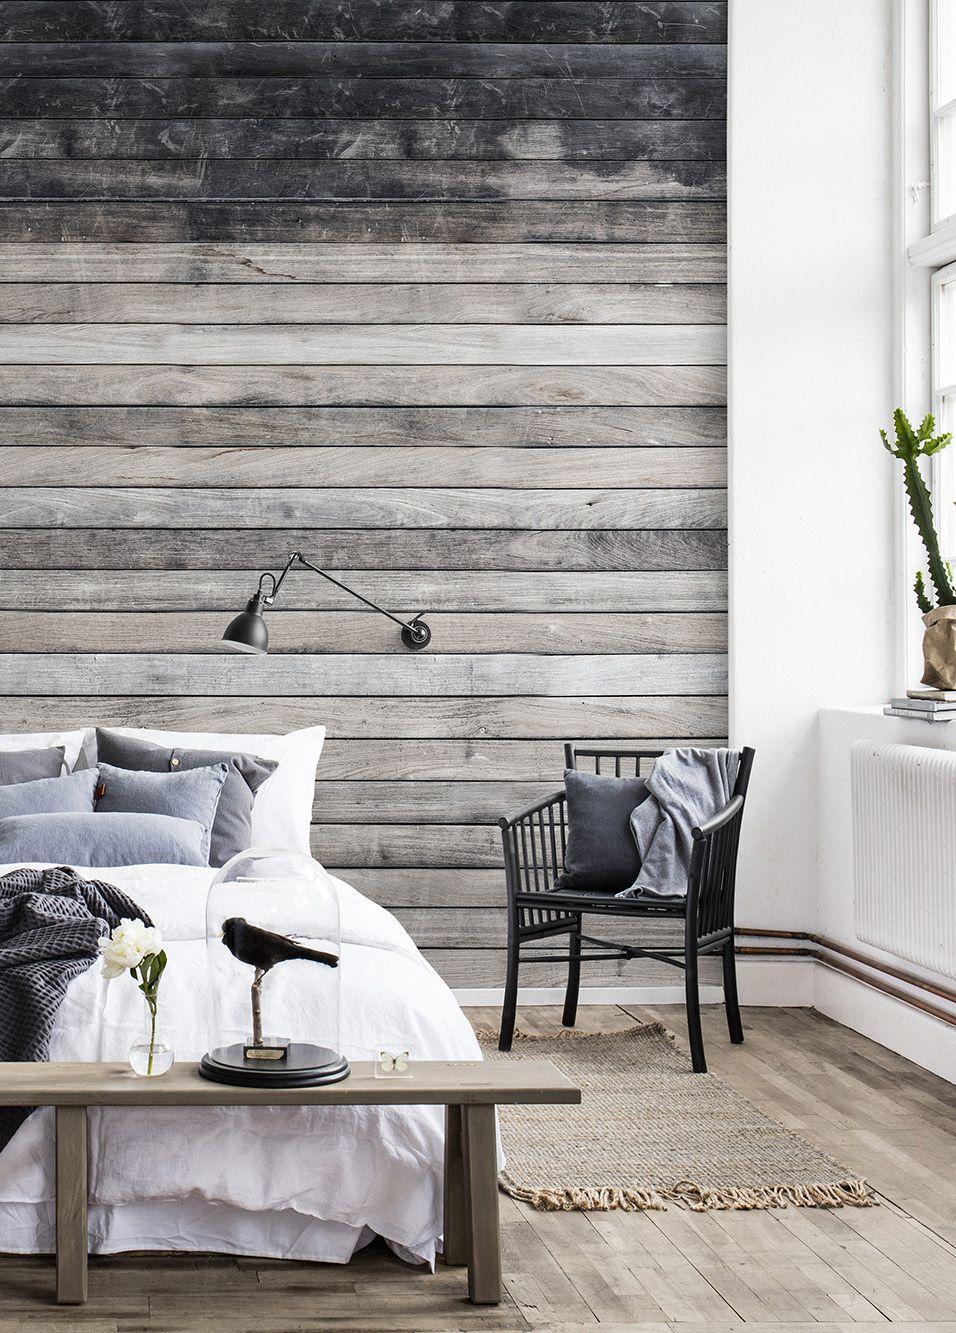 Full Size of Wanddeko Schlafzimmer Amazon Selber Machen Moderne Diy Wanddekoration Holz Modern Bilder Ideen Metall Pinterest Worn Wood Tapeten Wohnzimmer Deckenleuchten Led Wohnzimmer Wanddeko Schlafzimmer